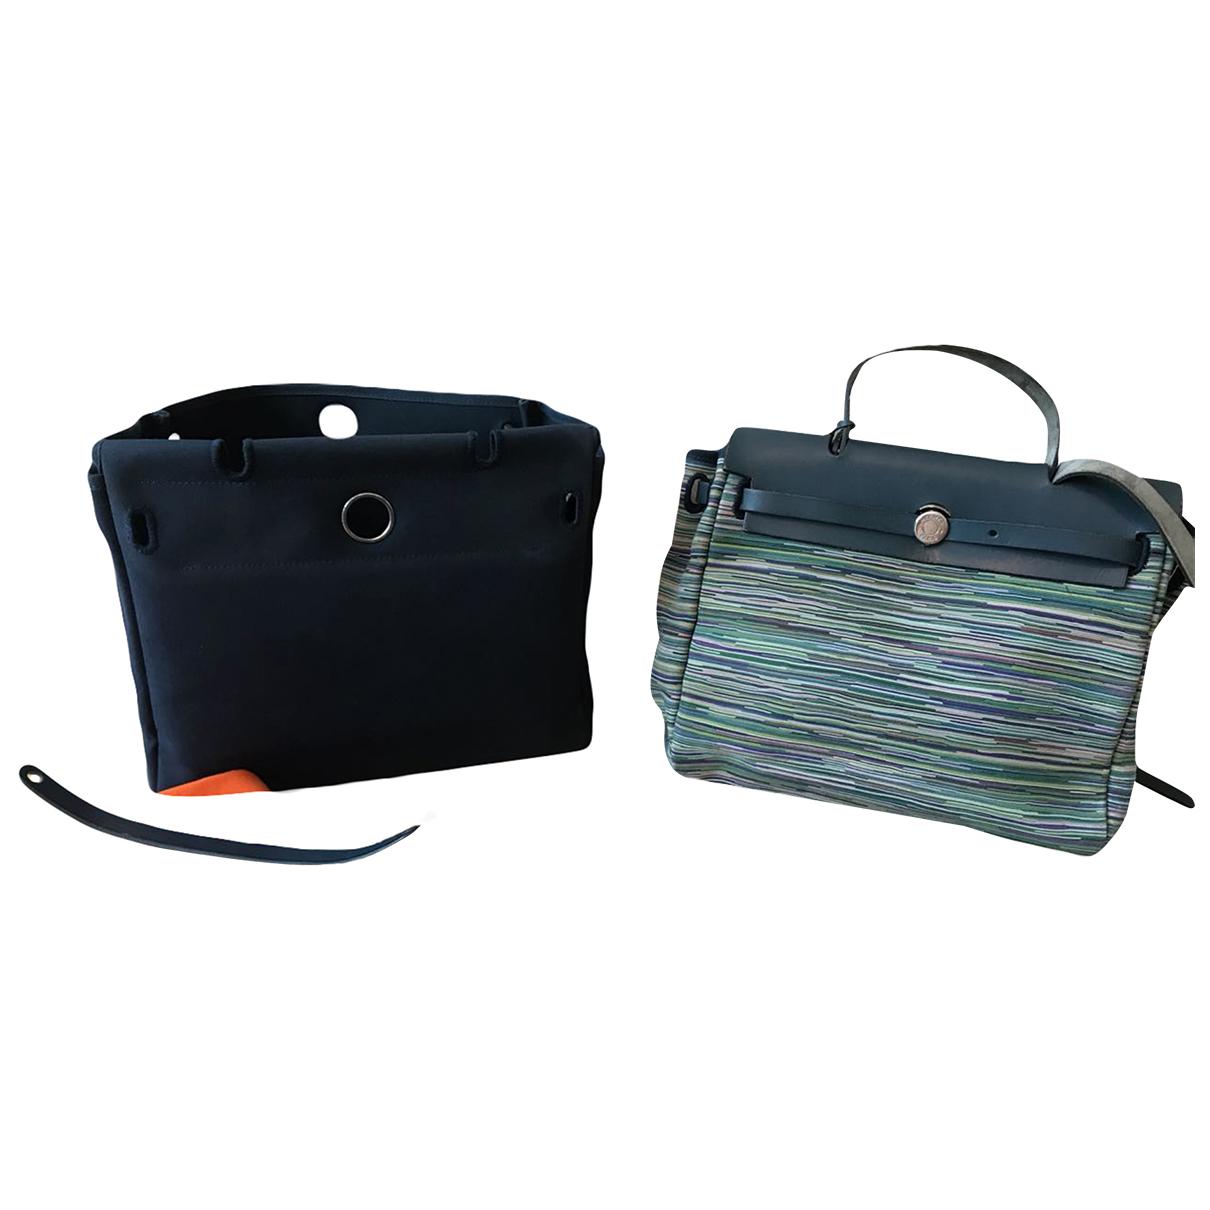 Hermes Herbag Handtasche in  Blau Veloursleder